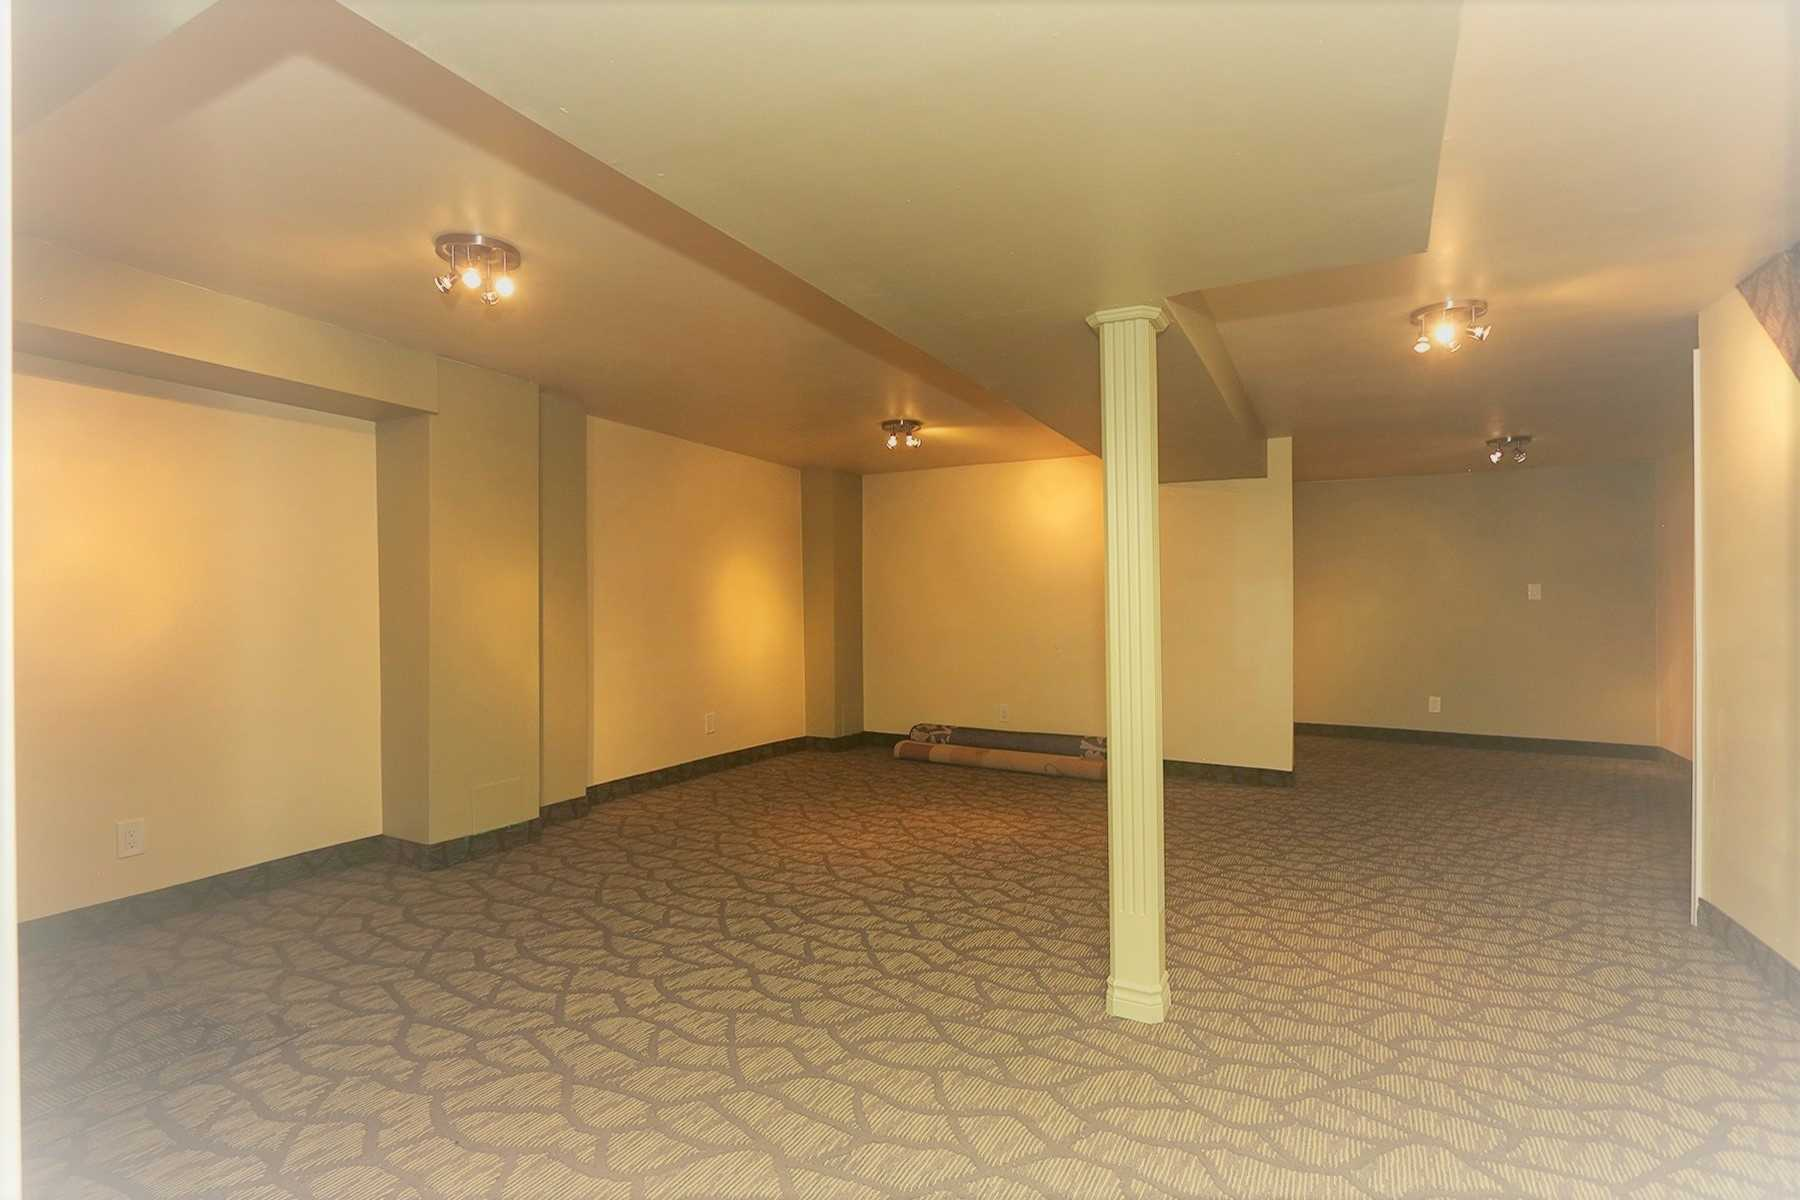 200 Borealis Ave, Aurora N4656319